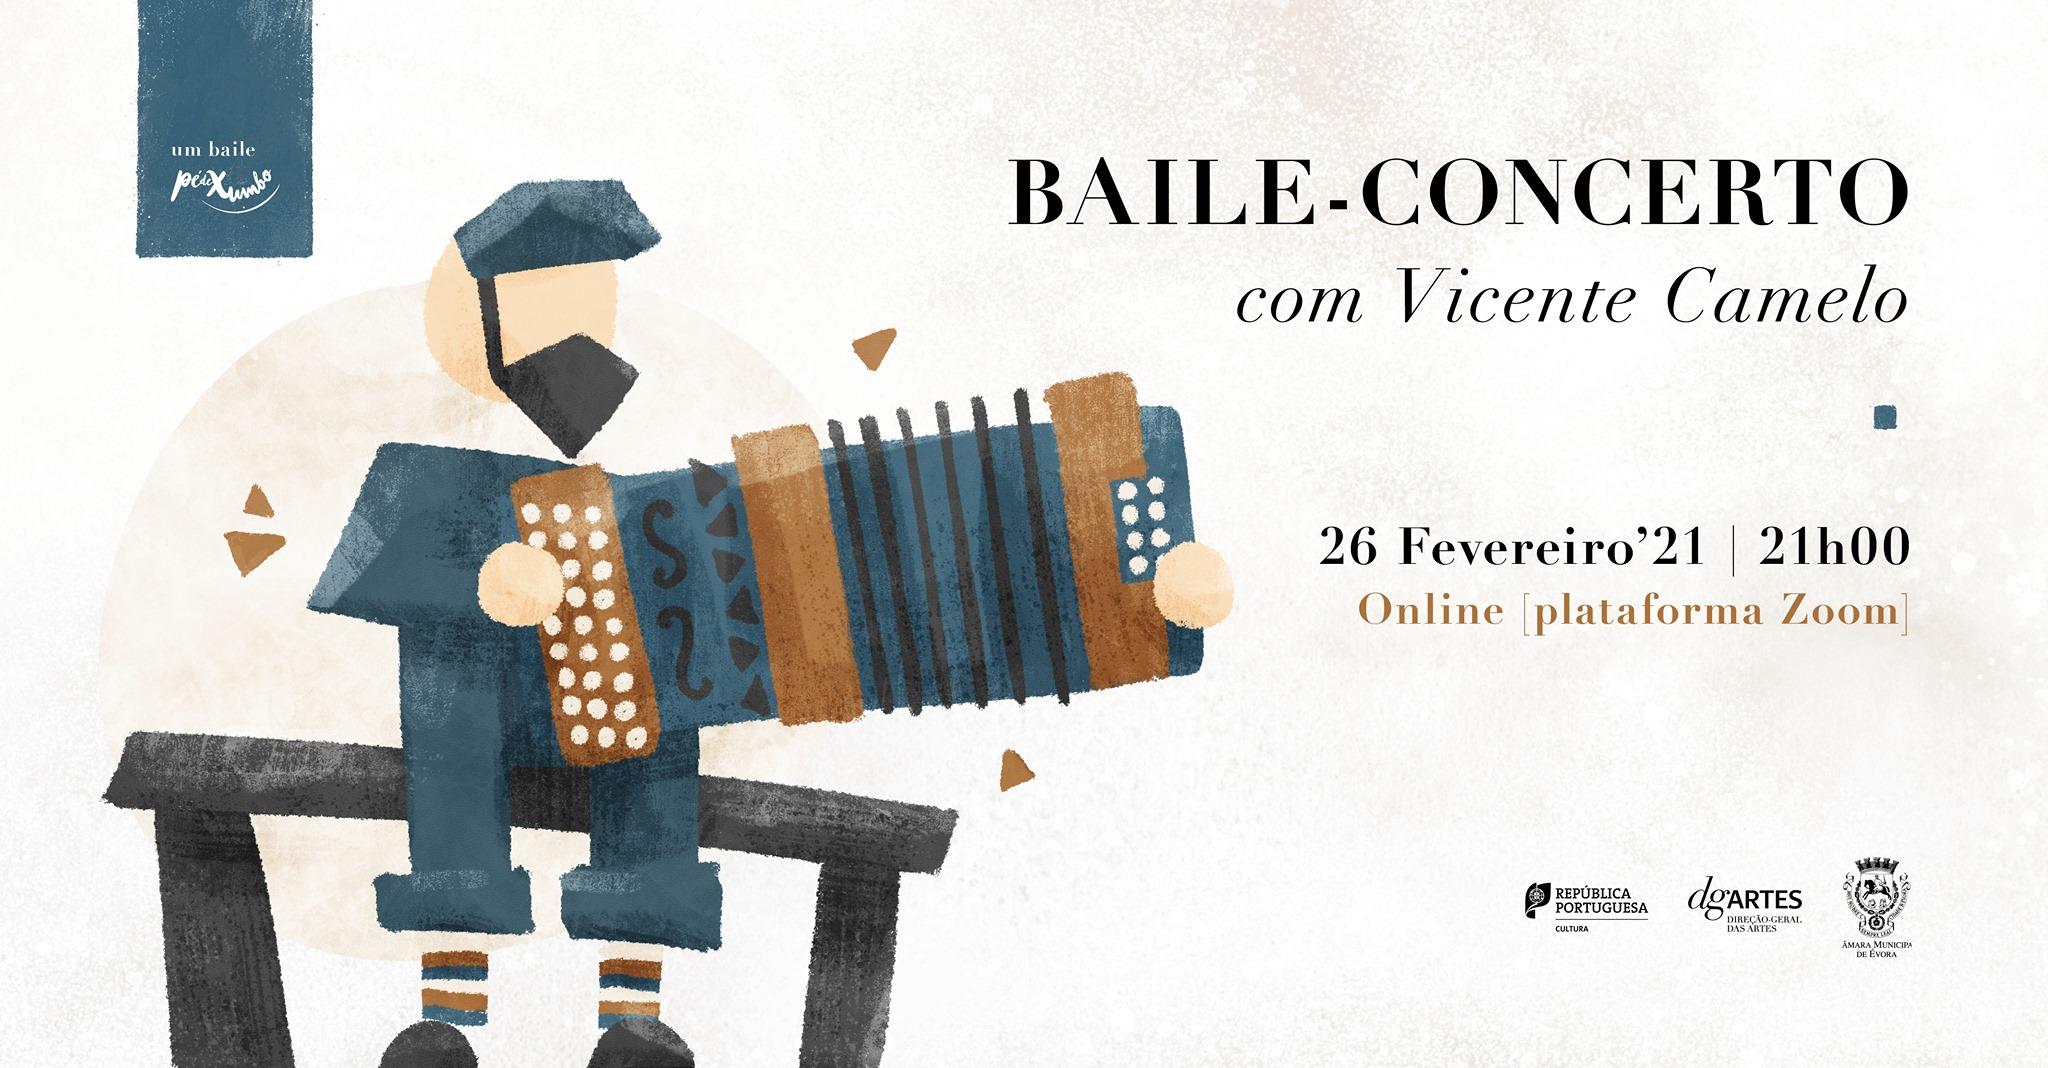 Bailes-concerto PédeXumbo 2021